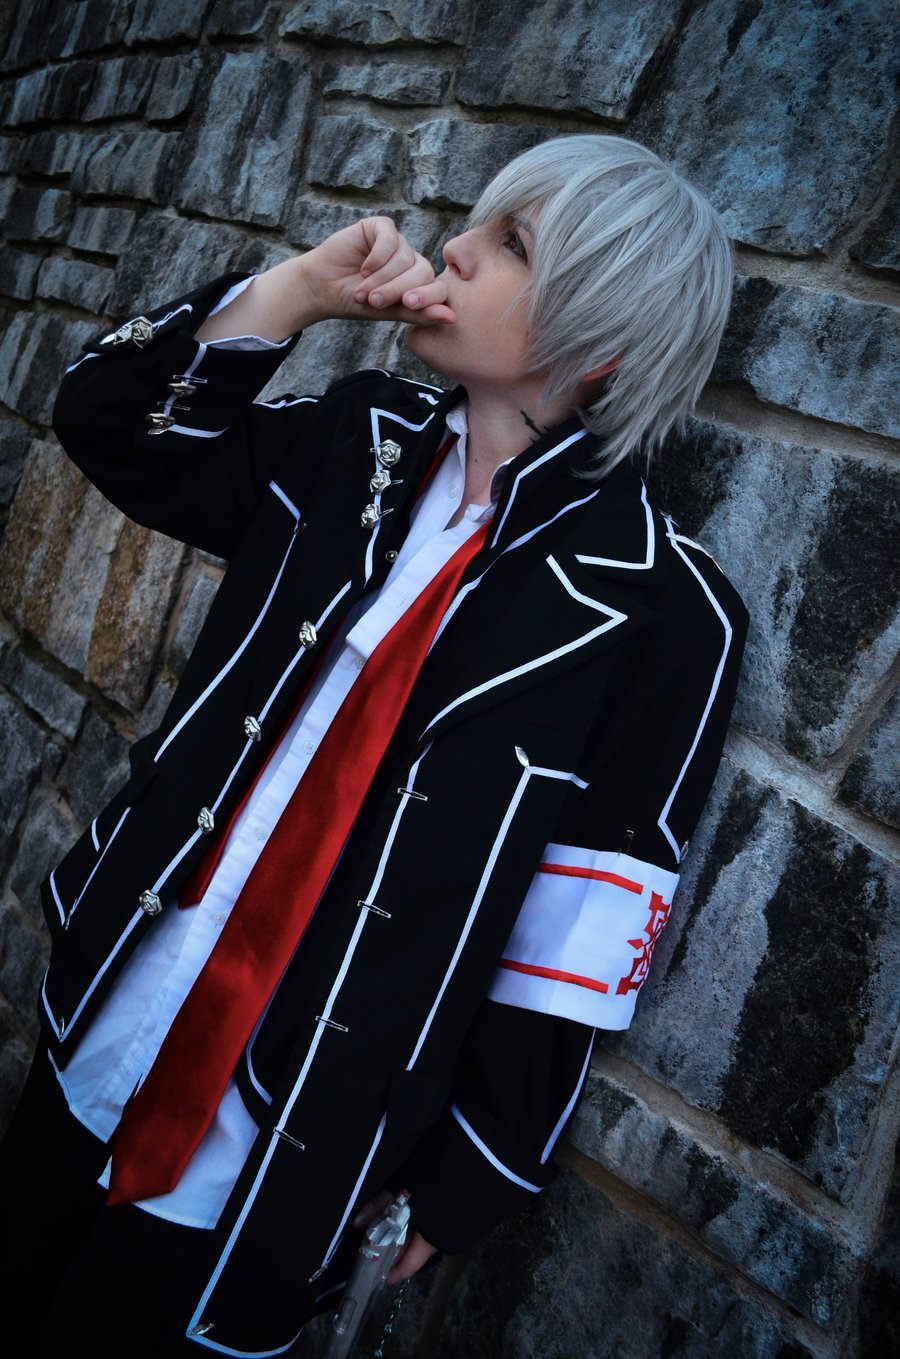 Zero Kiryu – School Uniform